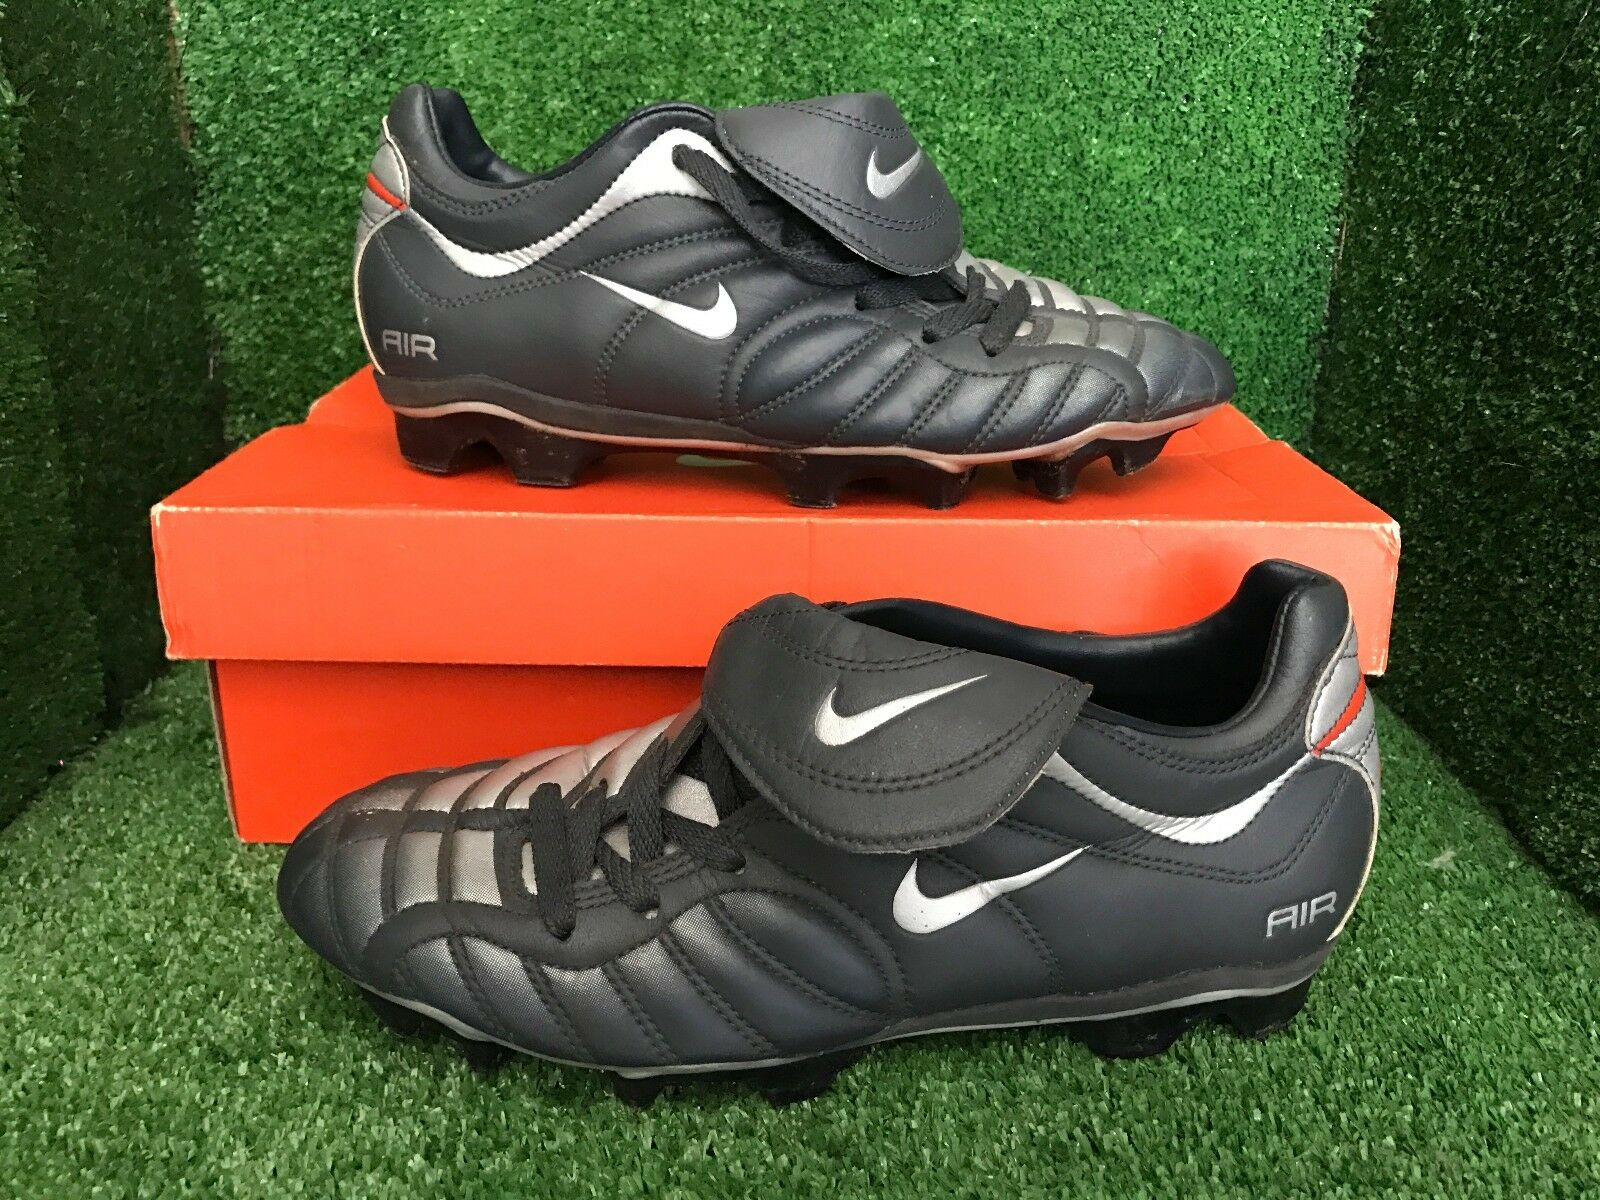 Nike Air Zoom Total 90 AZT FG botas de fútbol 7,5 8,5 42